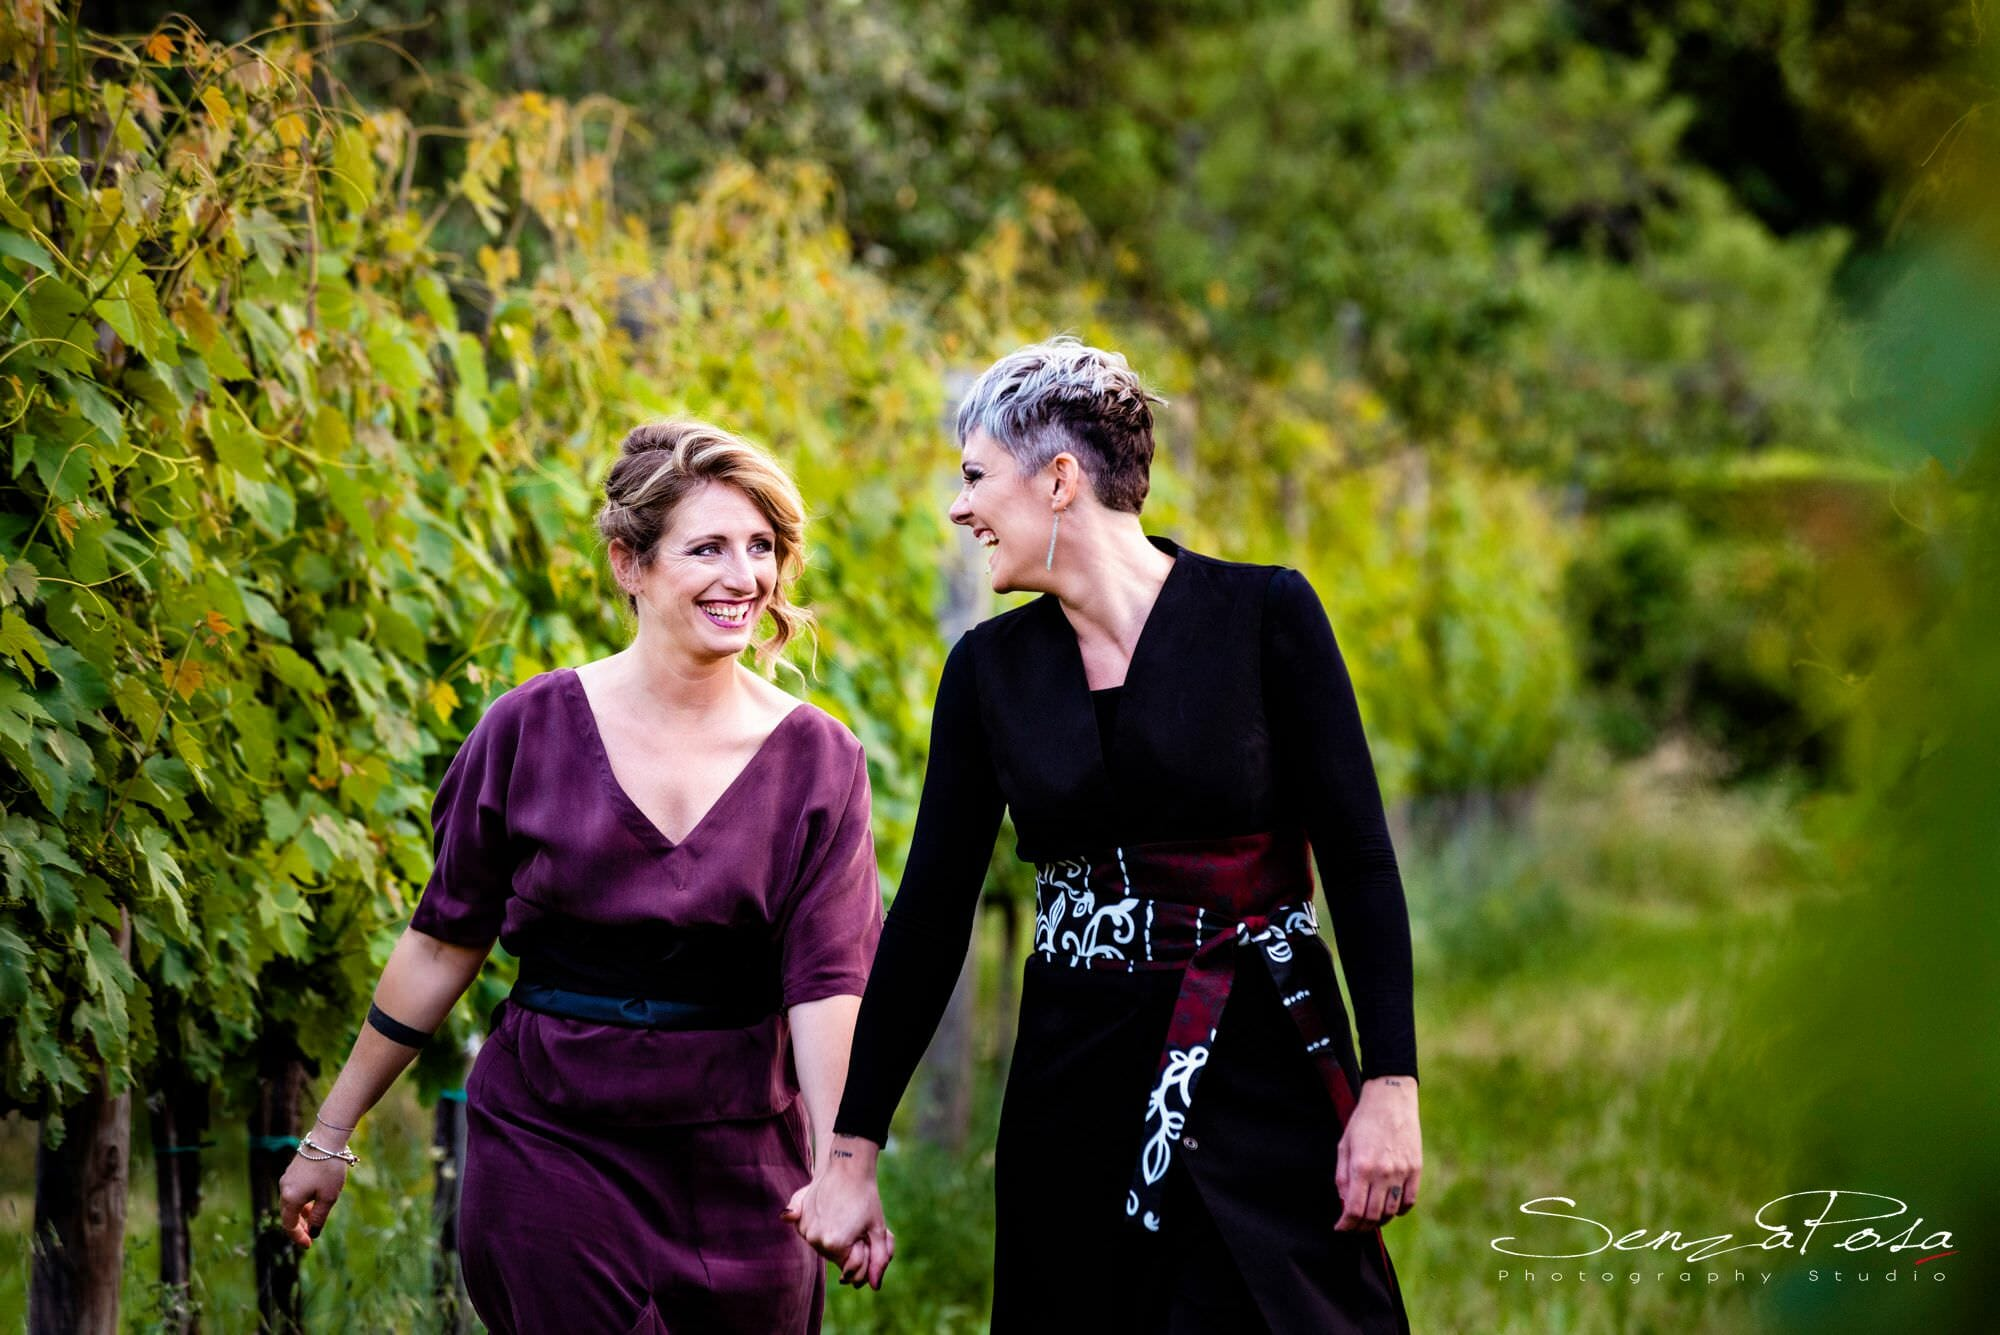 fotografo nozze gay e lgbt a firenze